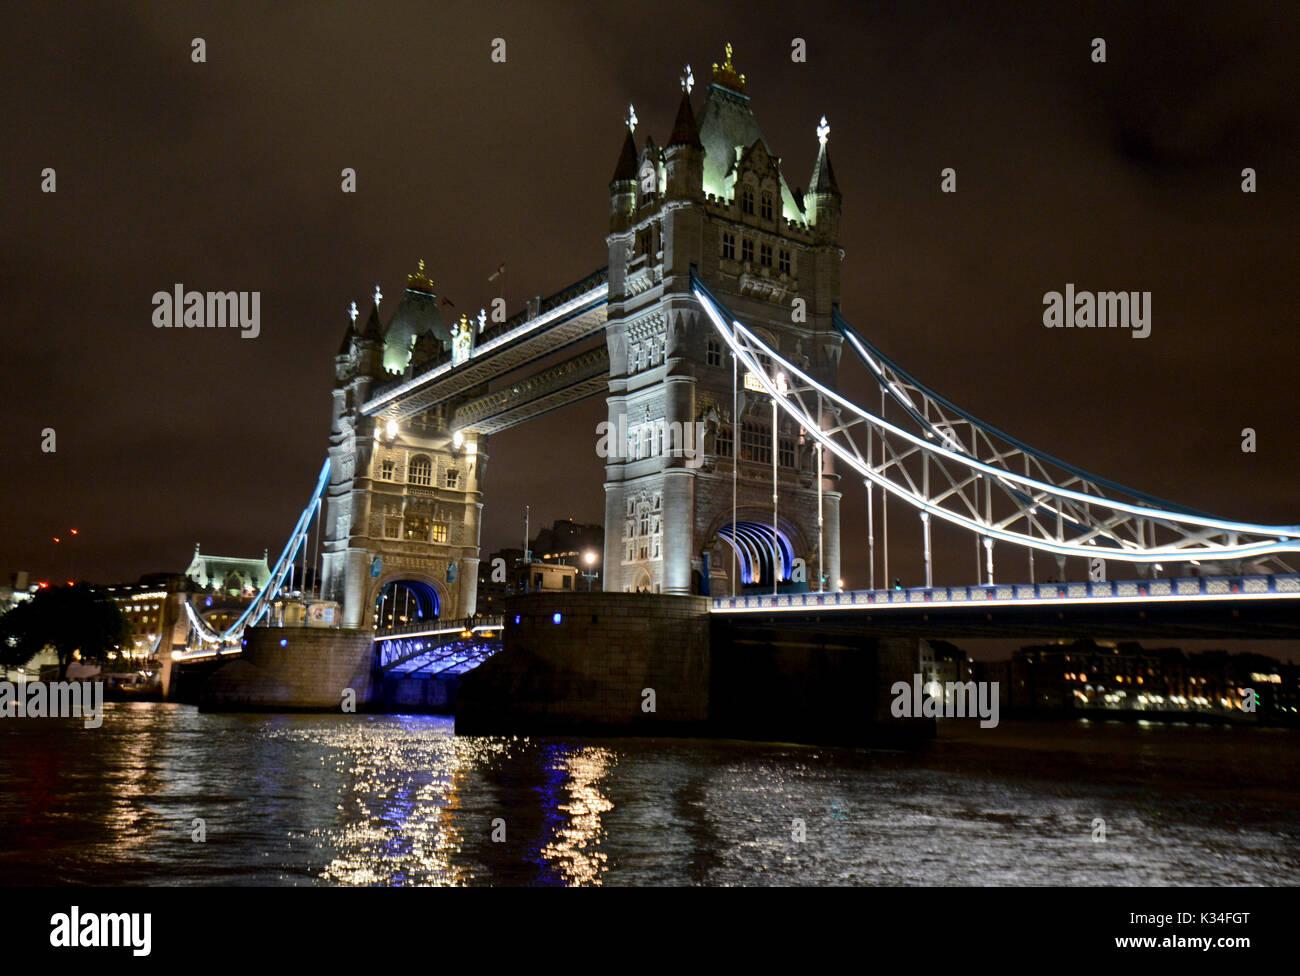 Tower Bridge by night, London Photo Stock